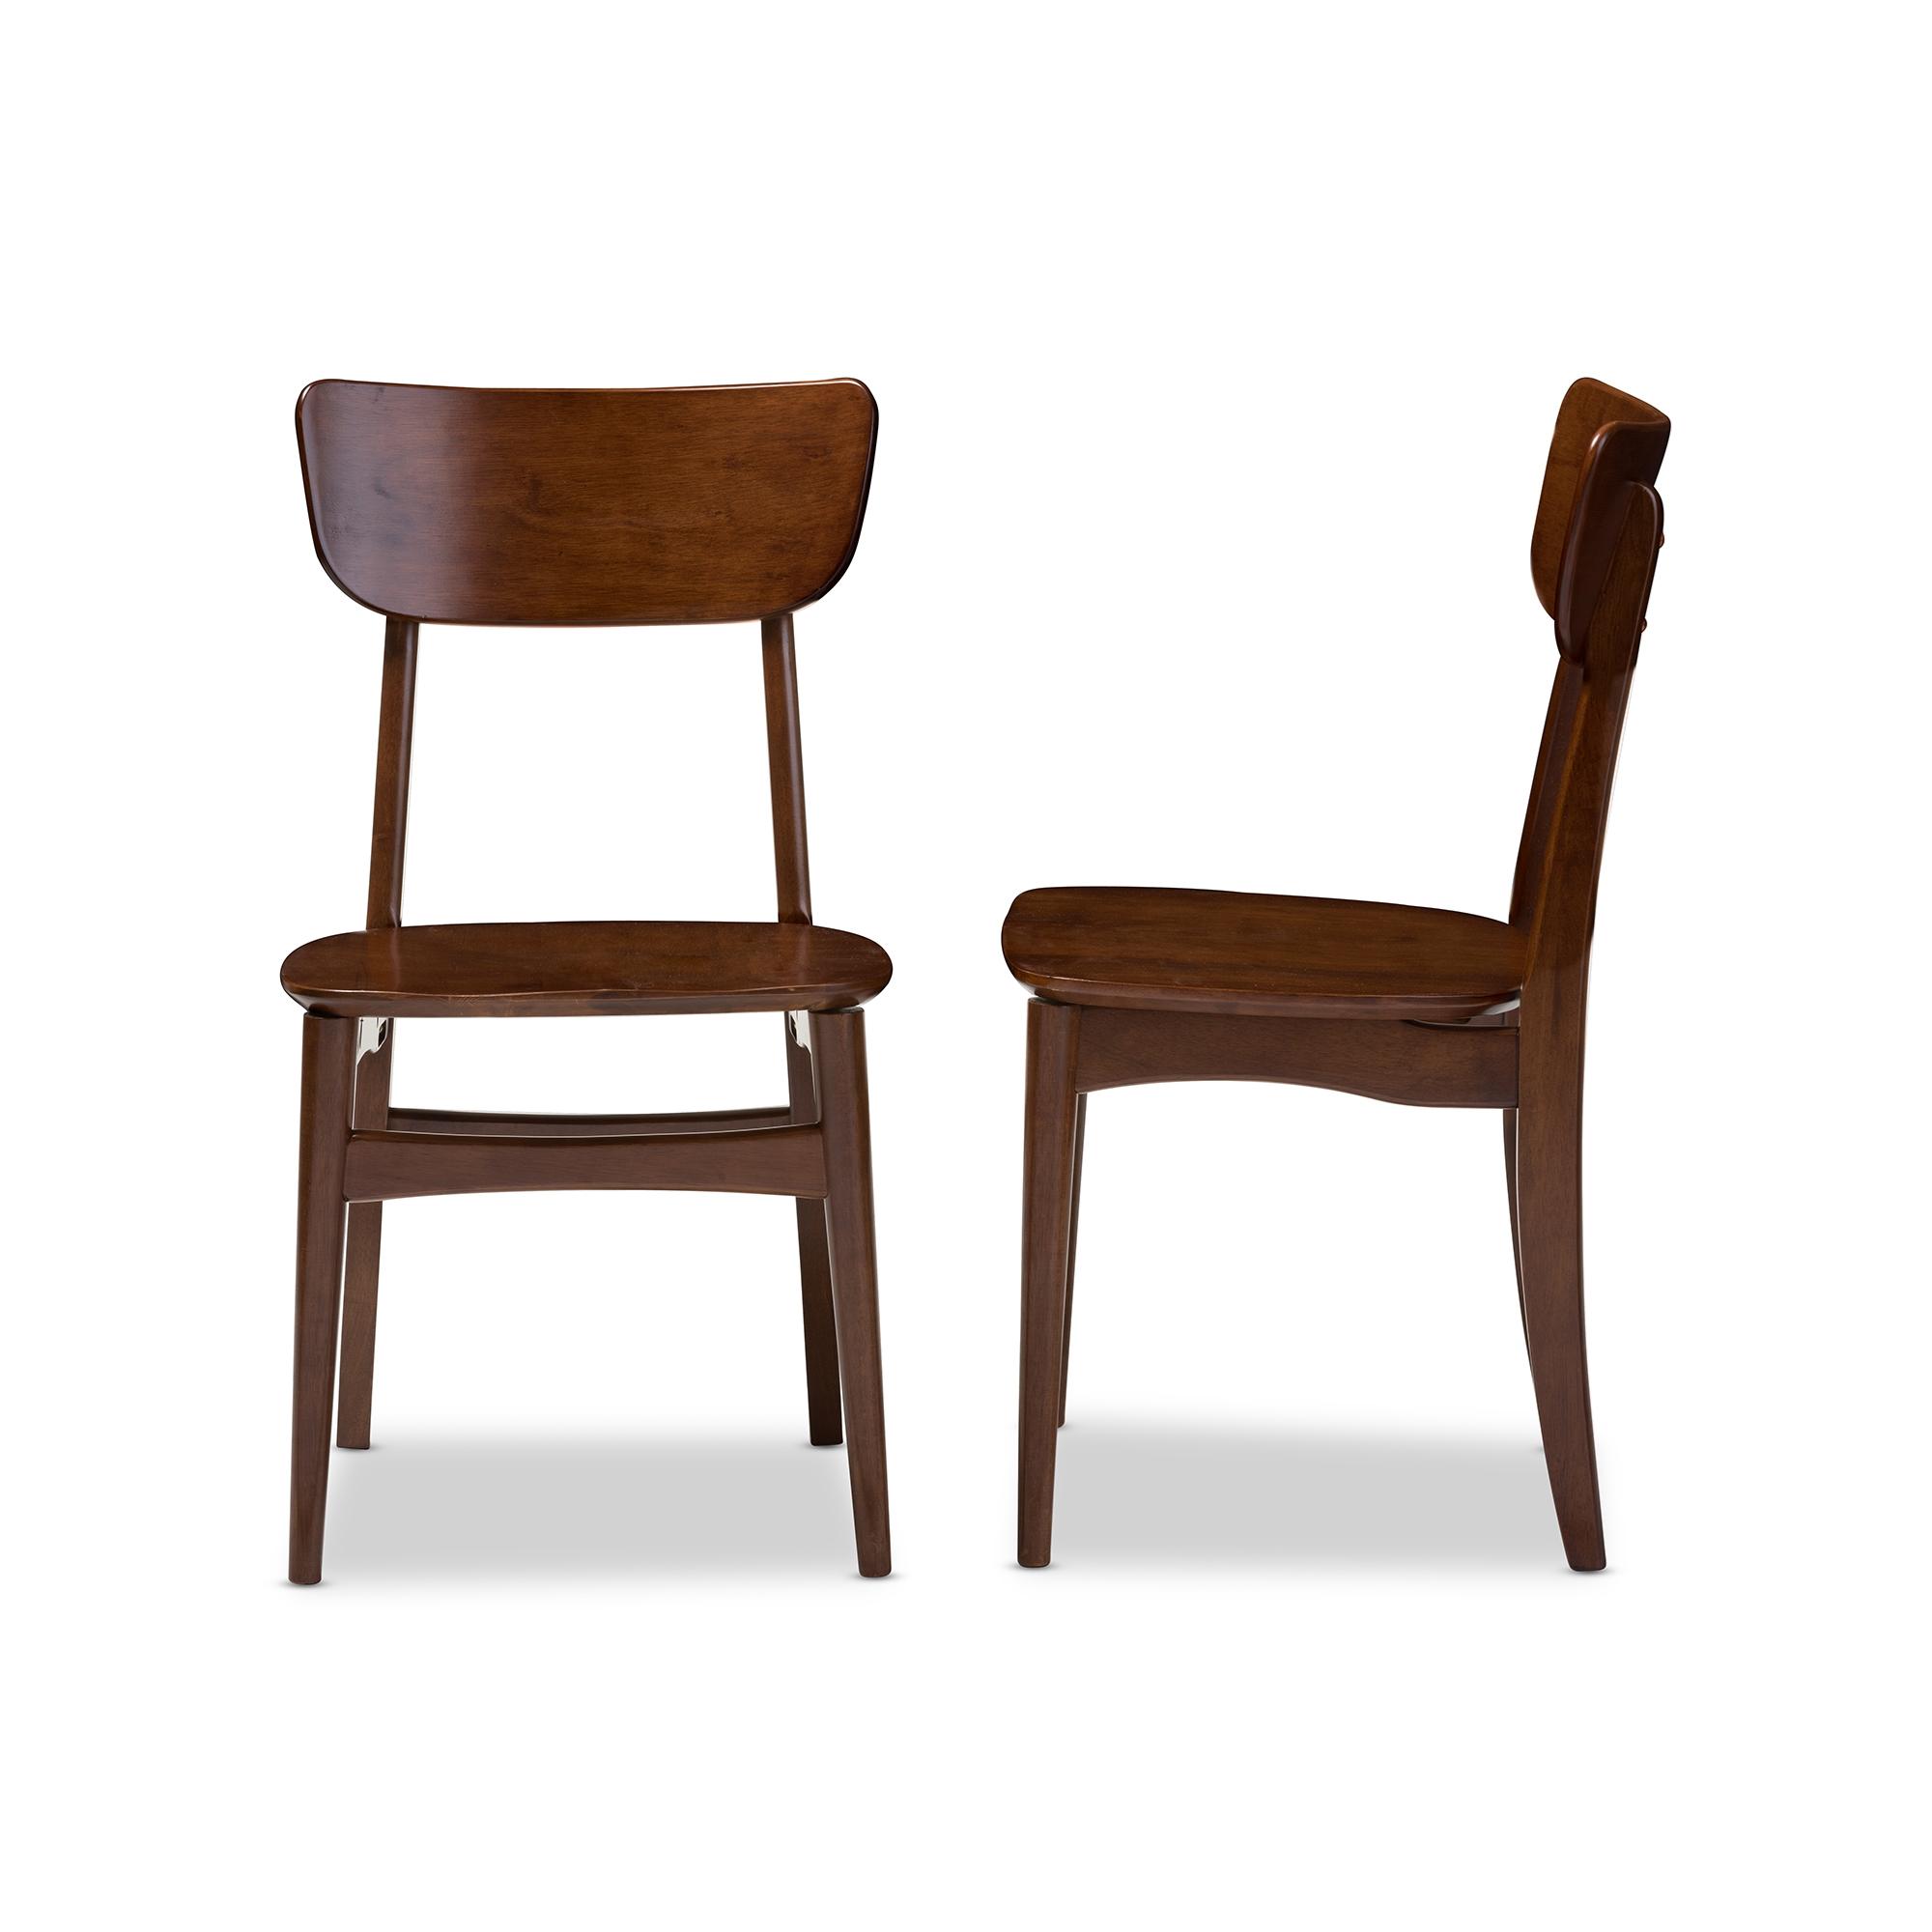 dark wood dining room furniture. baxton studio netherlands midcentury modern scandinavian style dark walnut bent wood dining side chair room furniture